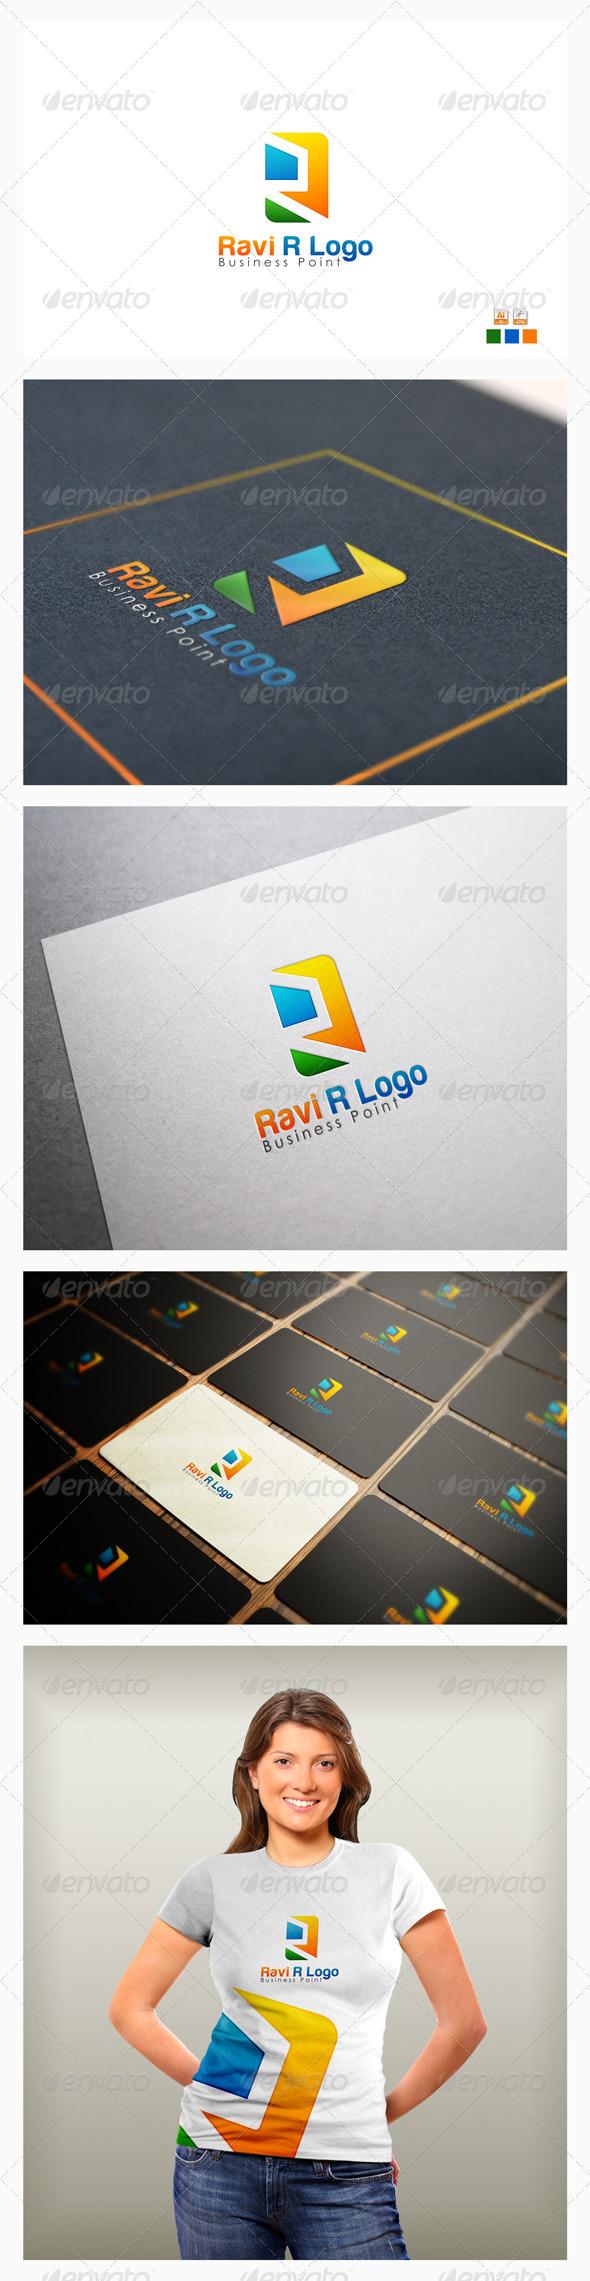 GraphicRiver Ravi R Logo 8102343